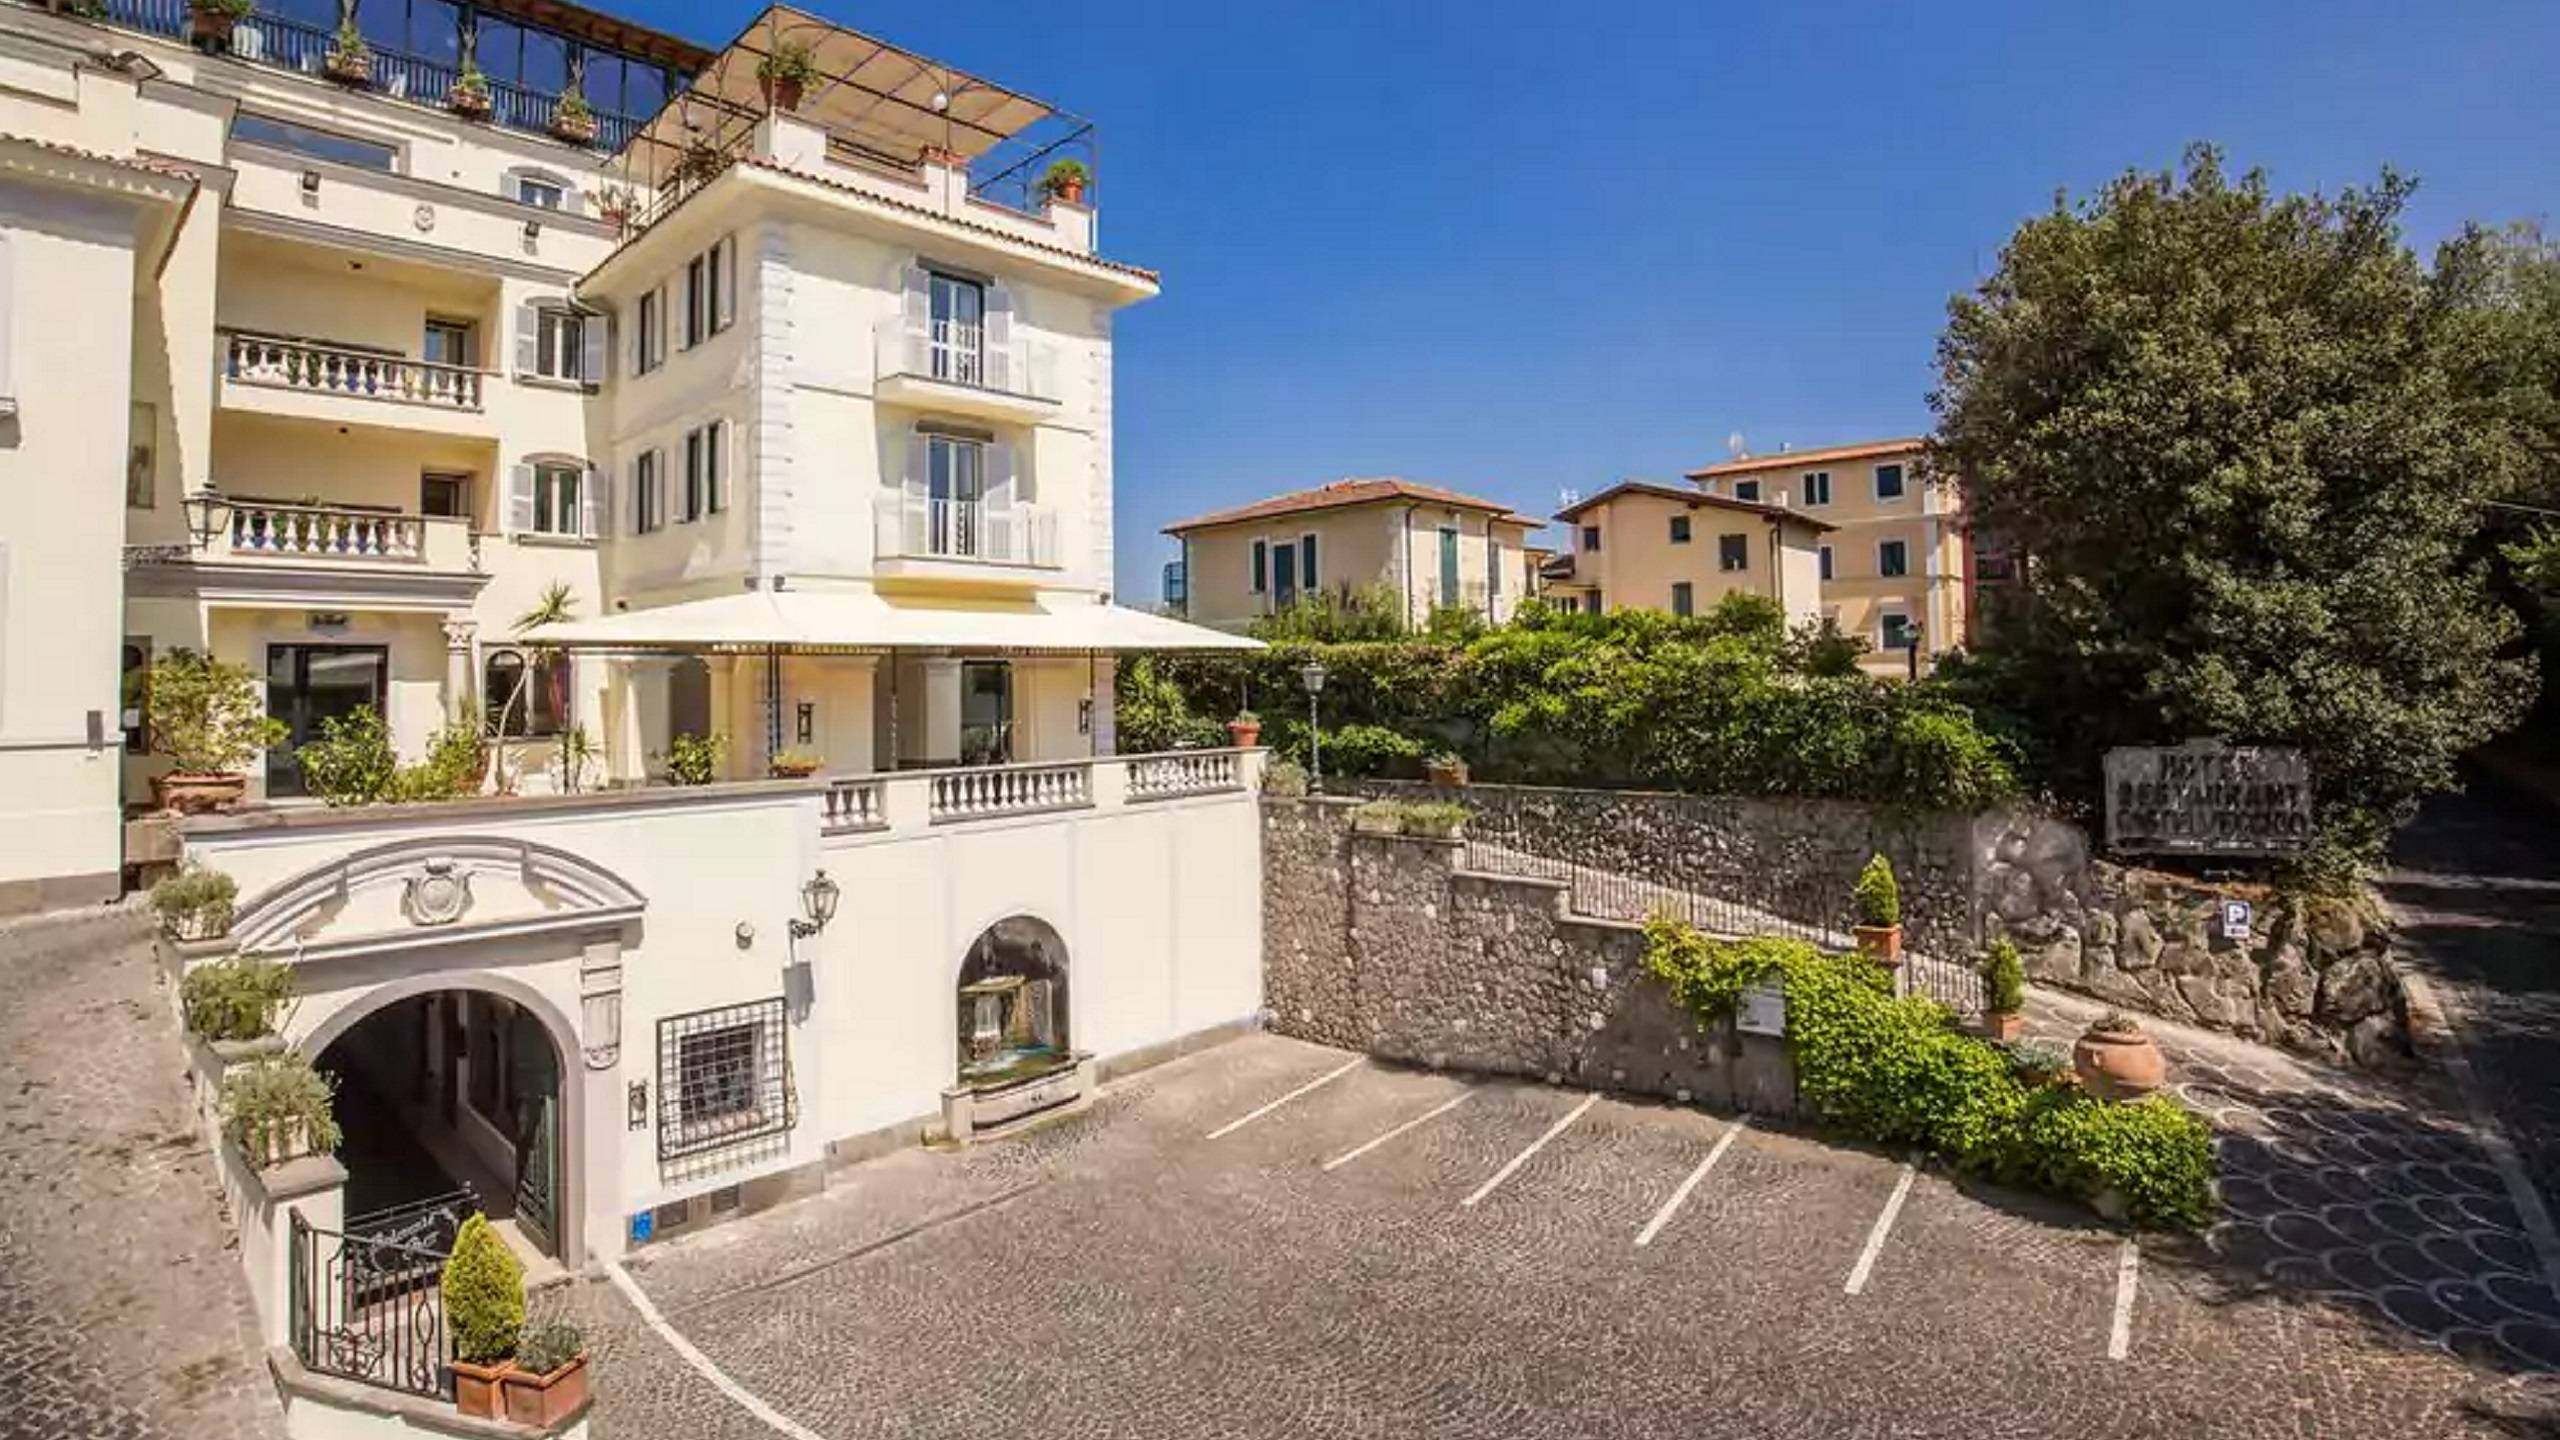 hotel-castel-vecchio-castel-gandolfo-entrance